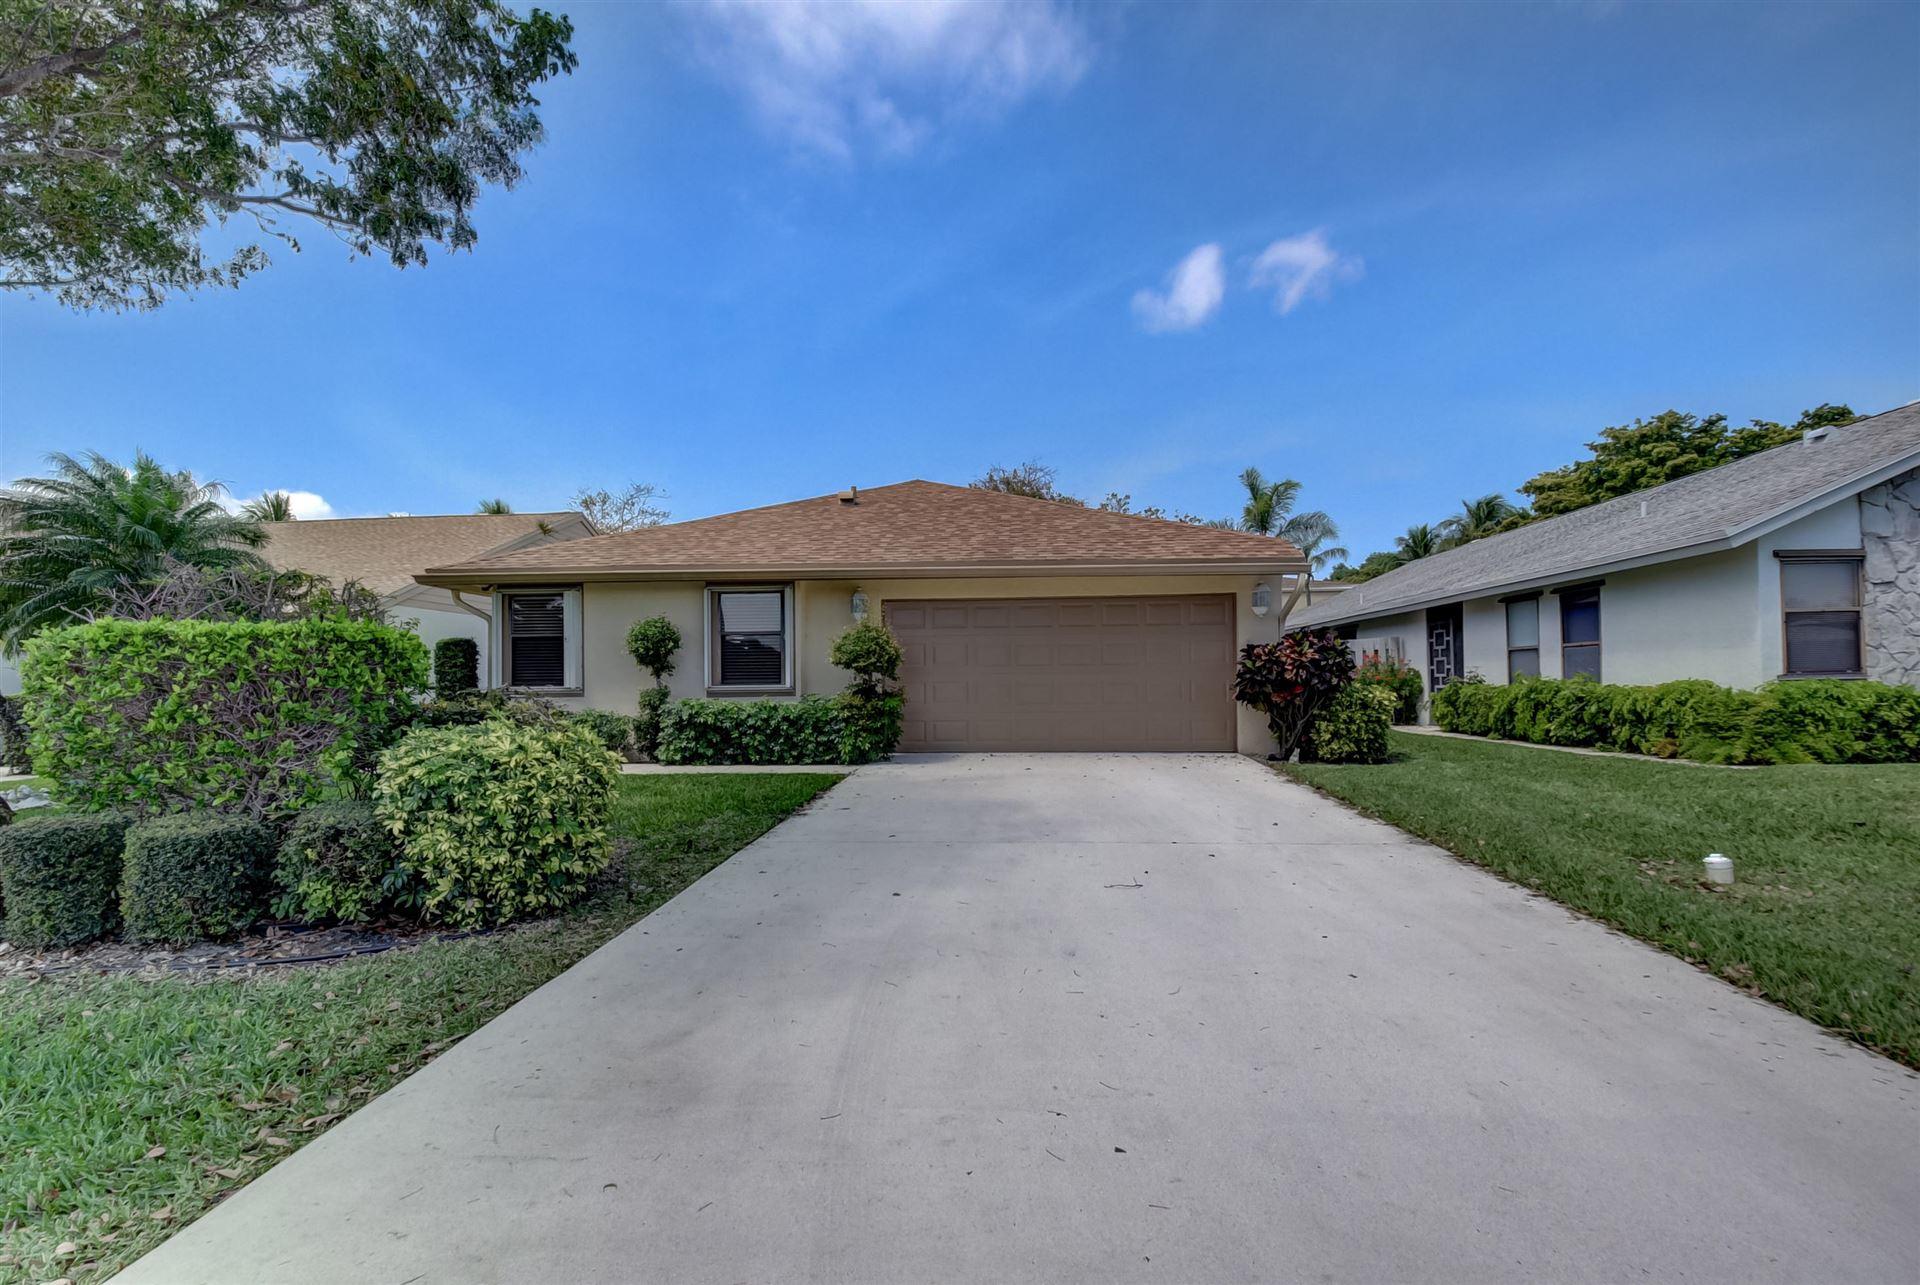 1300 NW 26th Lane, Delray Beach, FL 33445 - #: RX-10702200